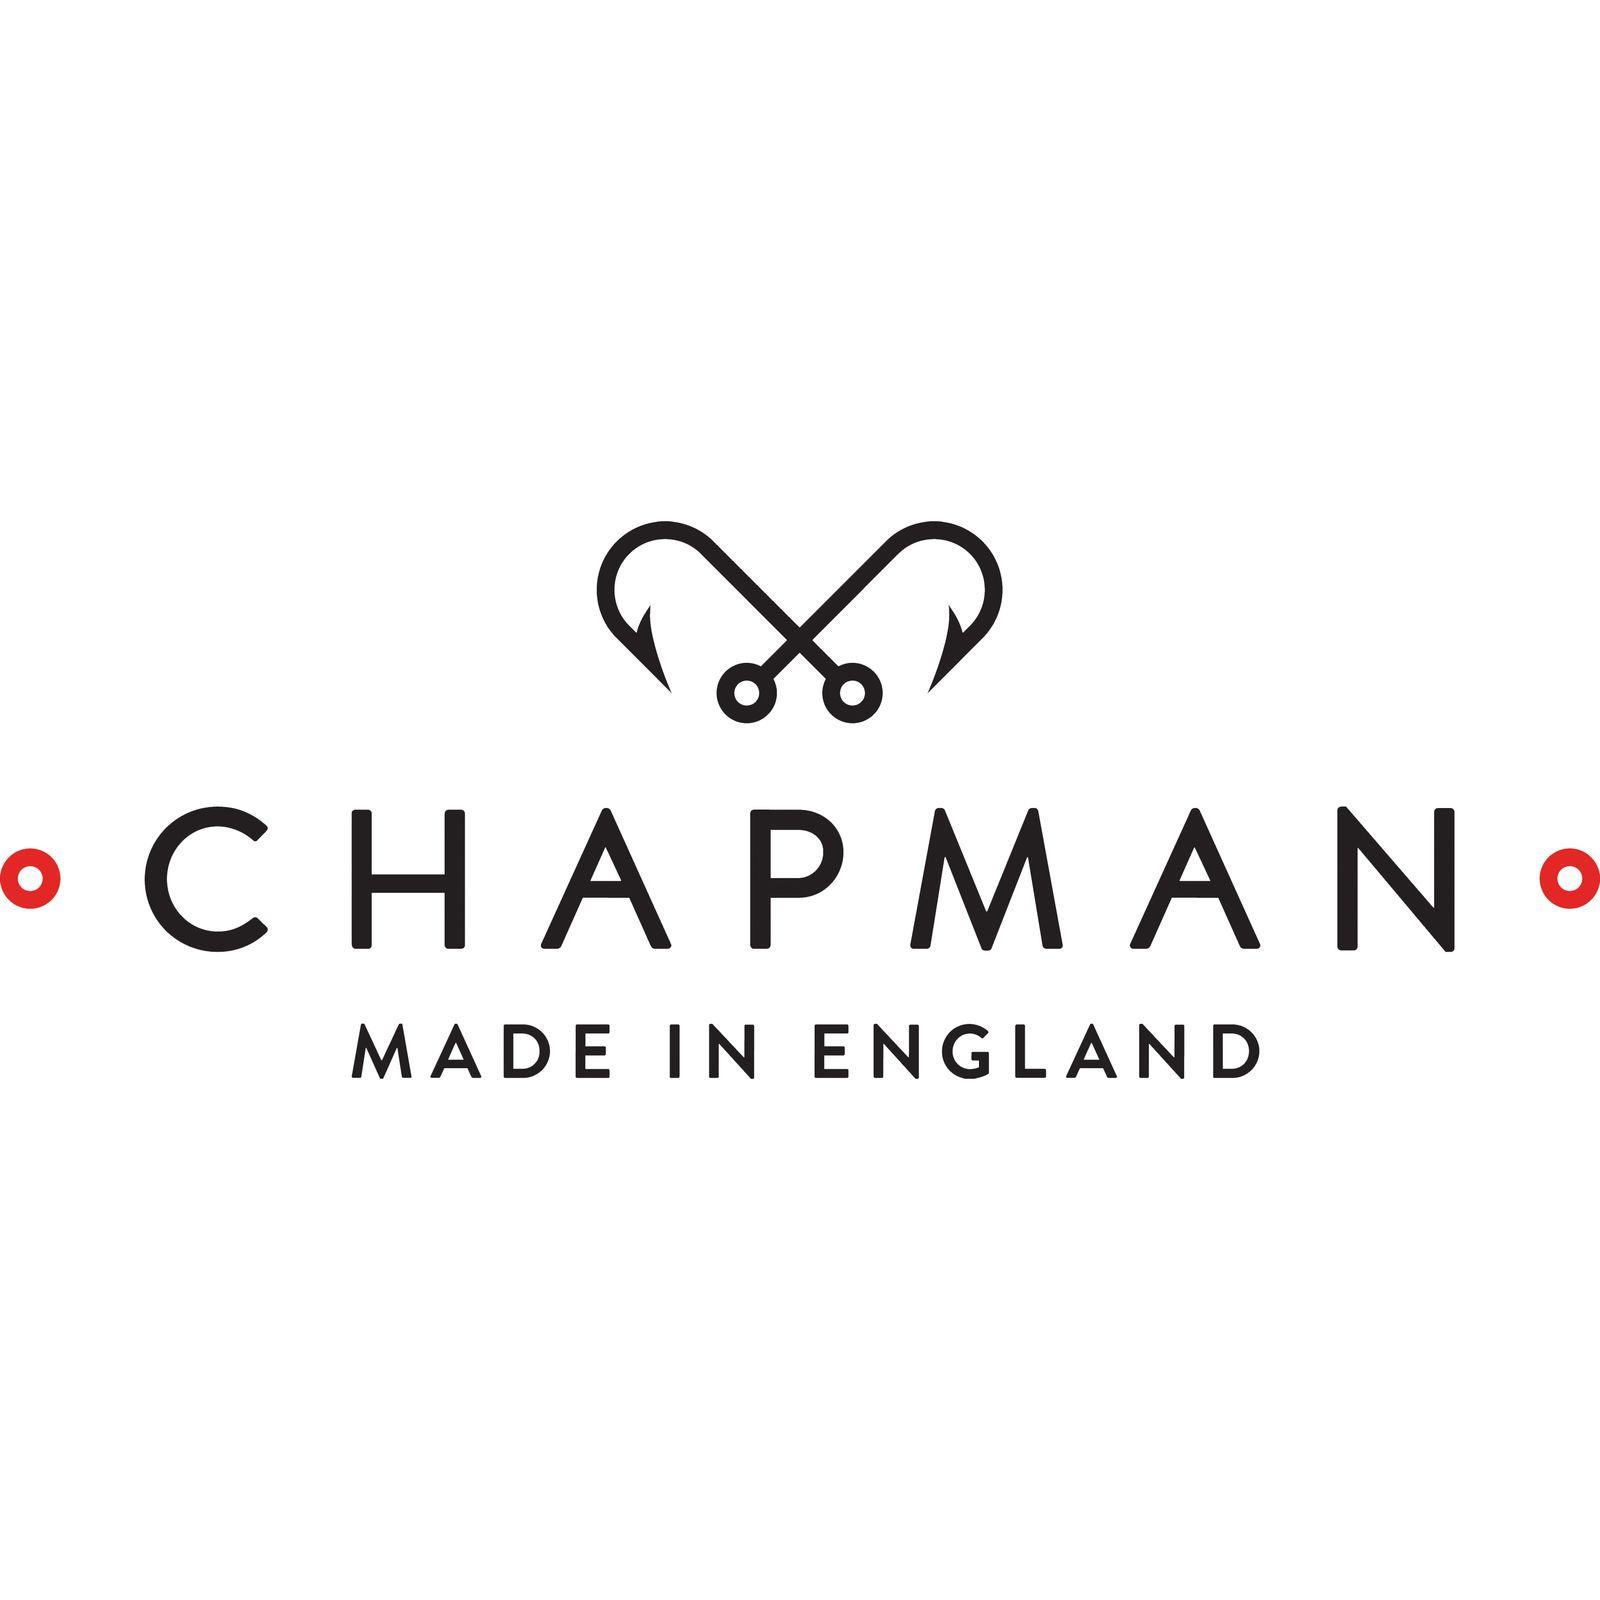 CHAPMAN (Bild 1)